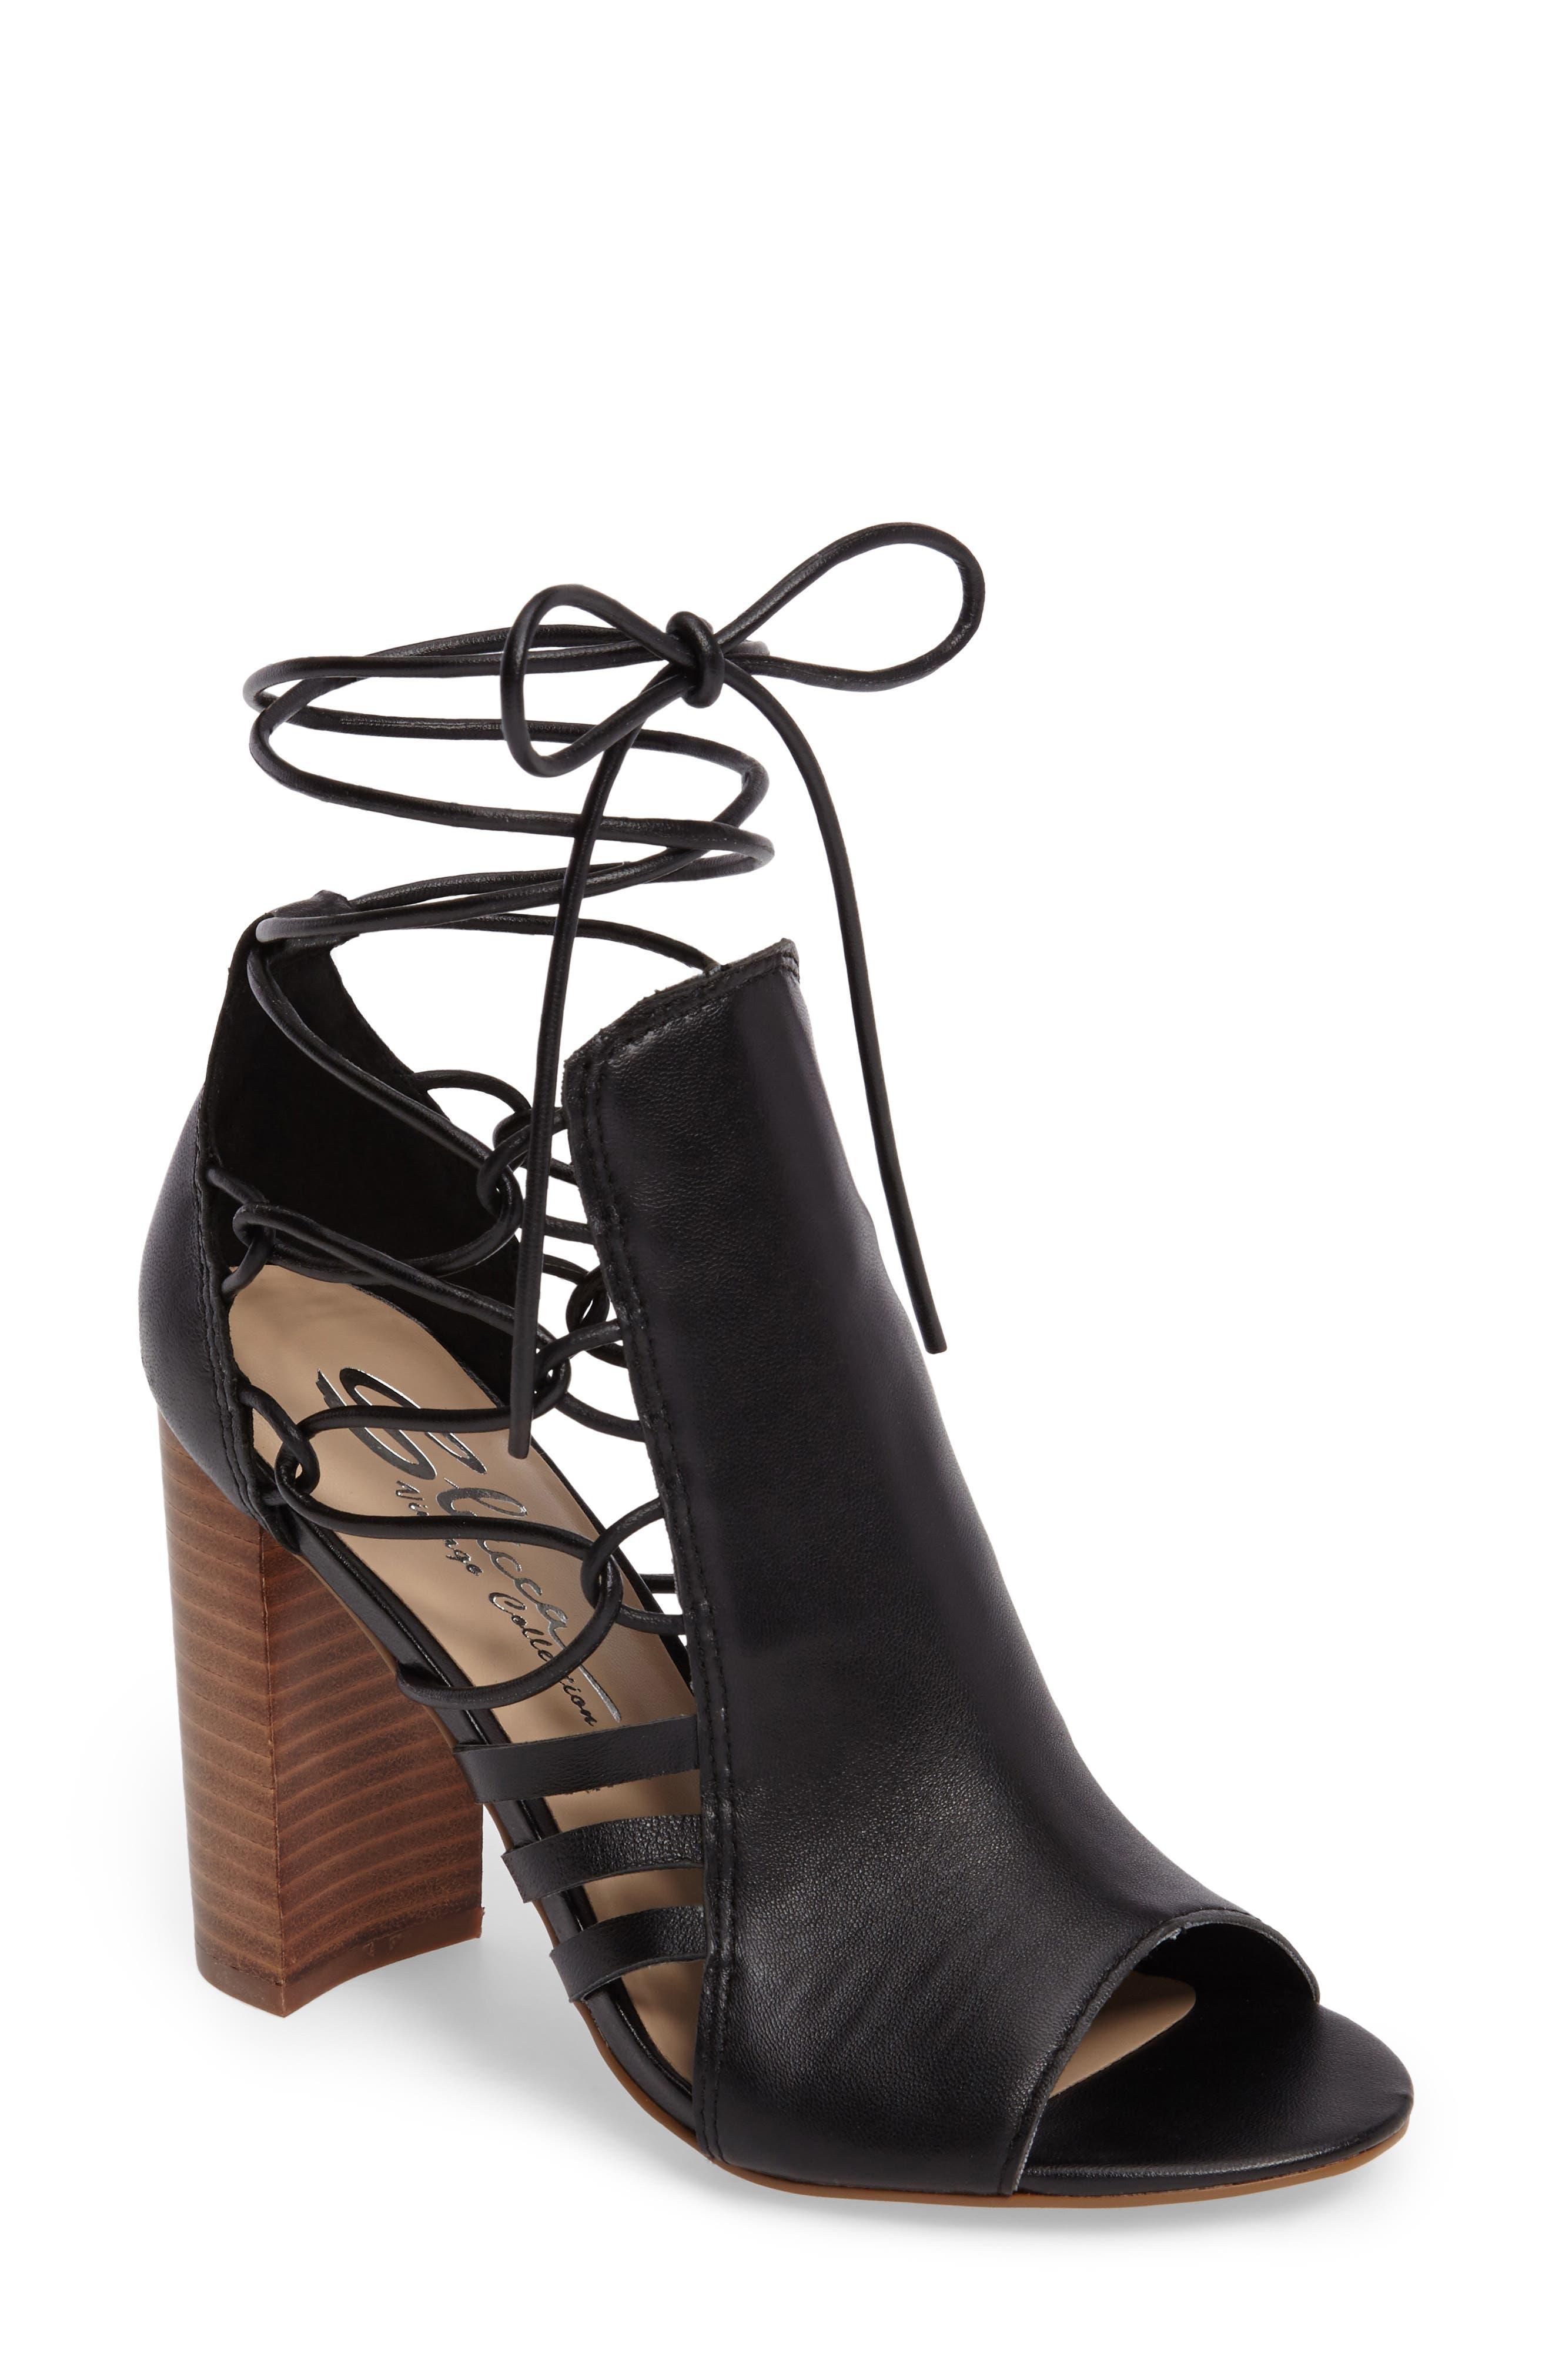 Adette Ankle Tie Sandal,                         Main,                         color, 001